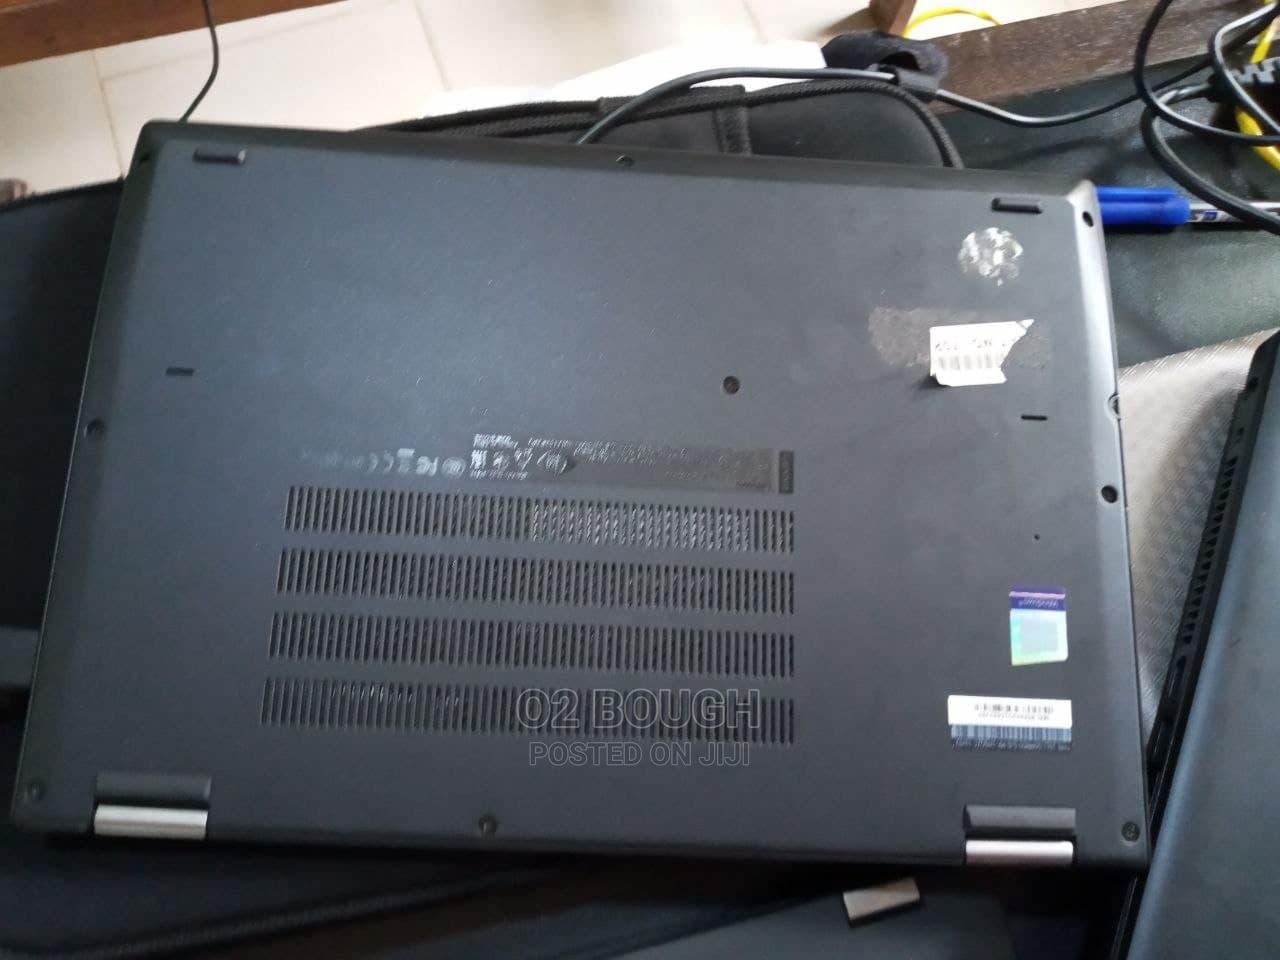 Laptop Lenovo ThinkPad Yoga 8GB Intel Core I5 SSD 256GB   Laptops & Computers for sale in Ibadan, Oyo State, Nigeria